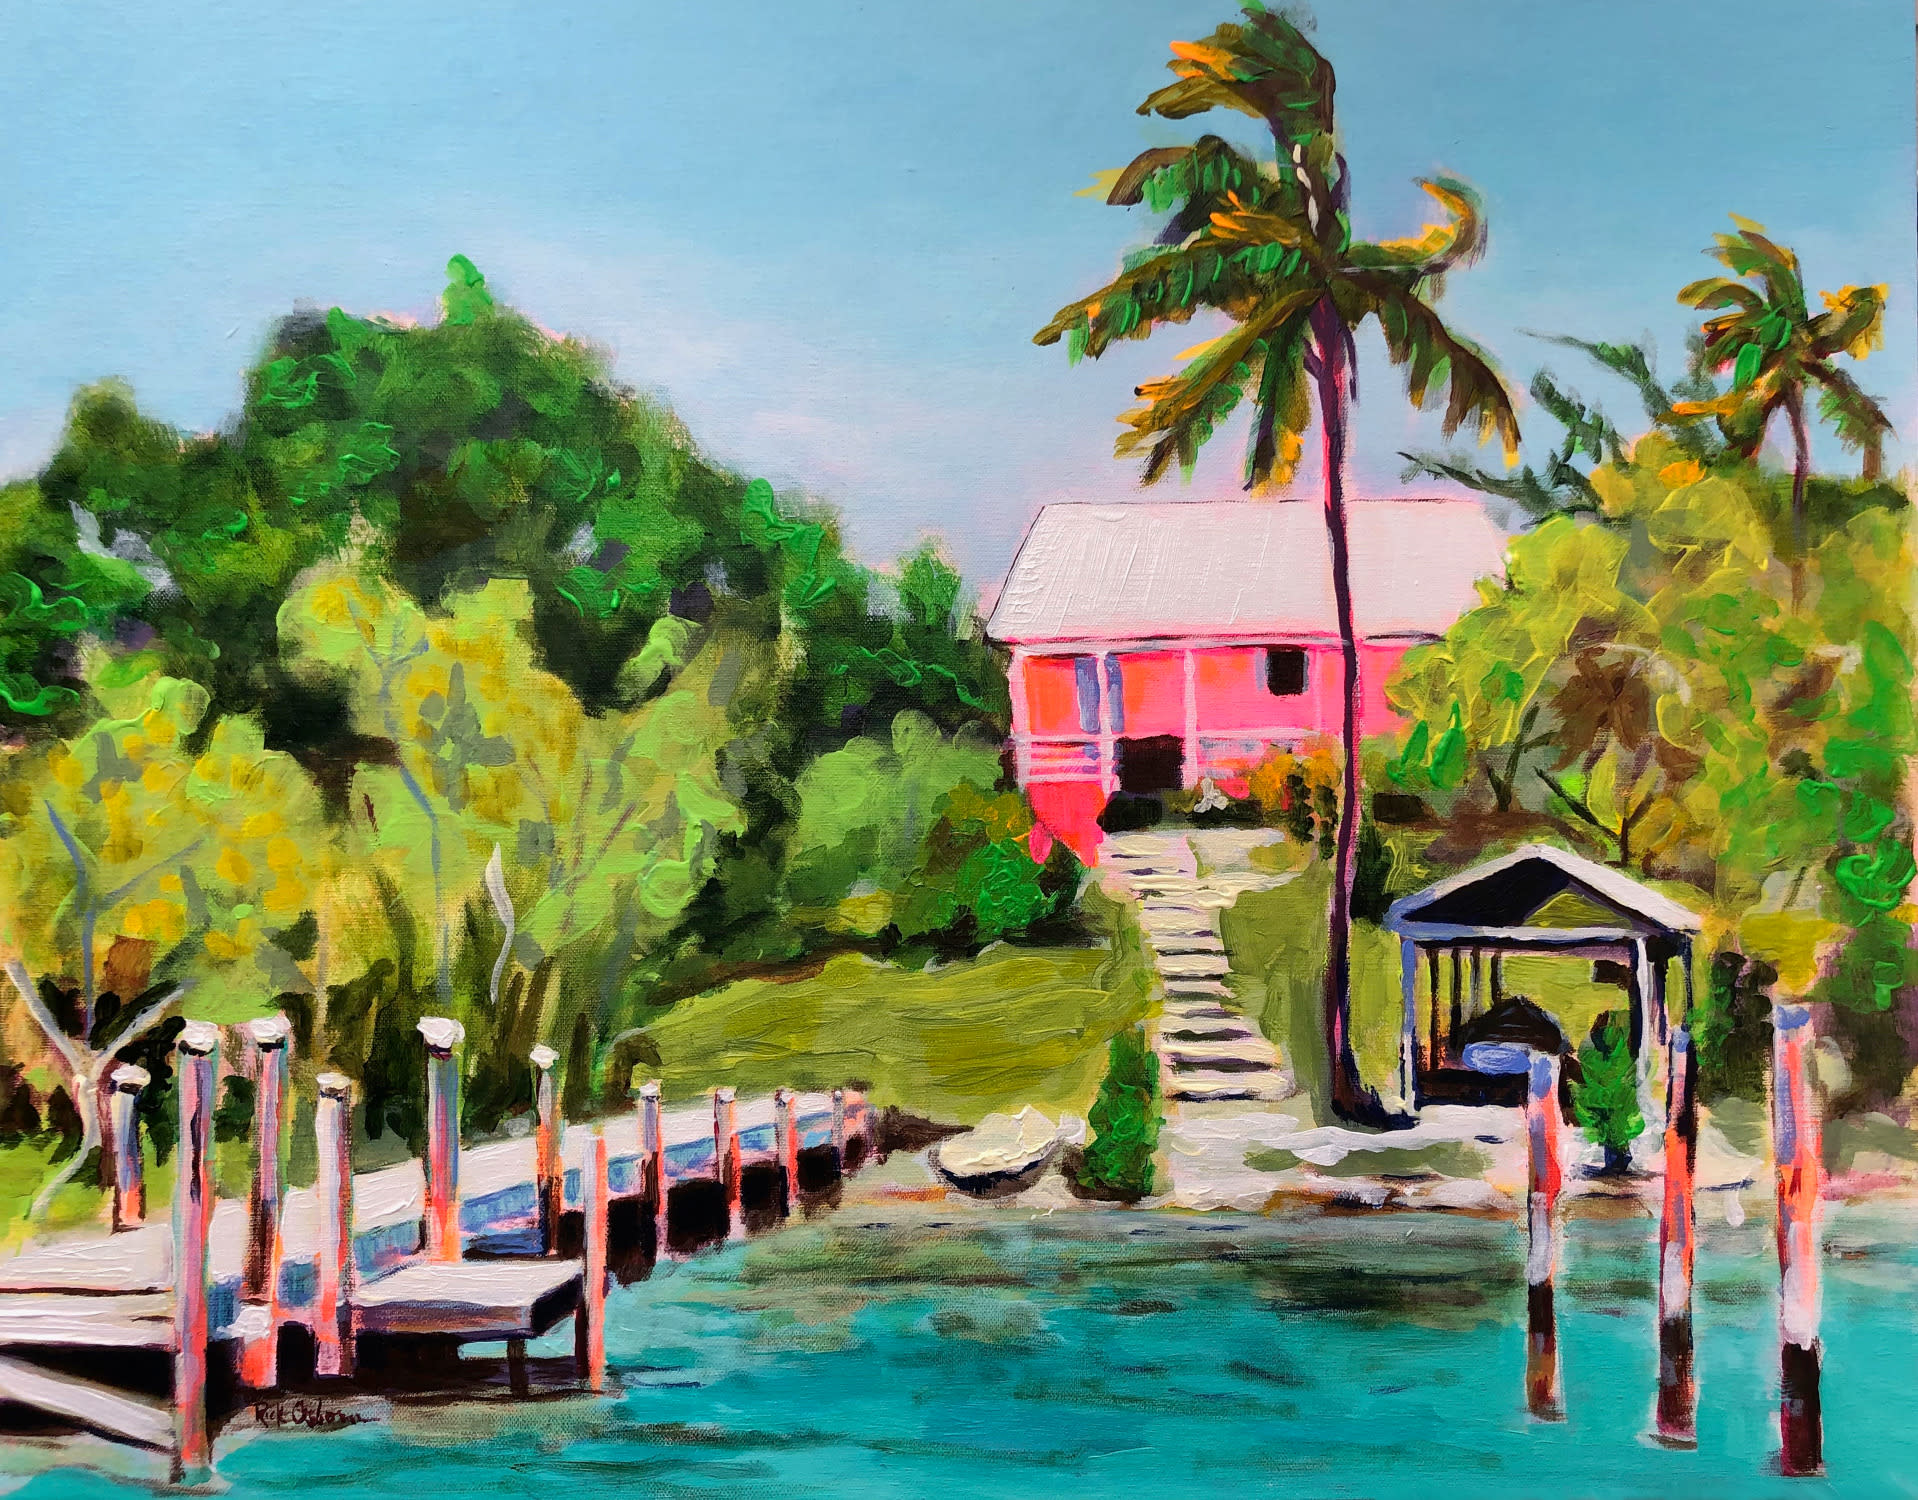 Channel house bahamas sm vahrip